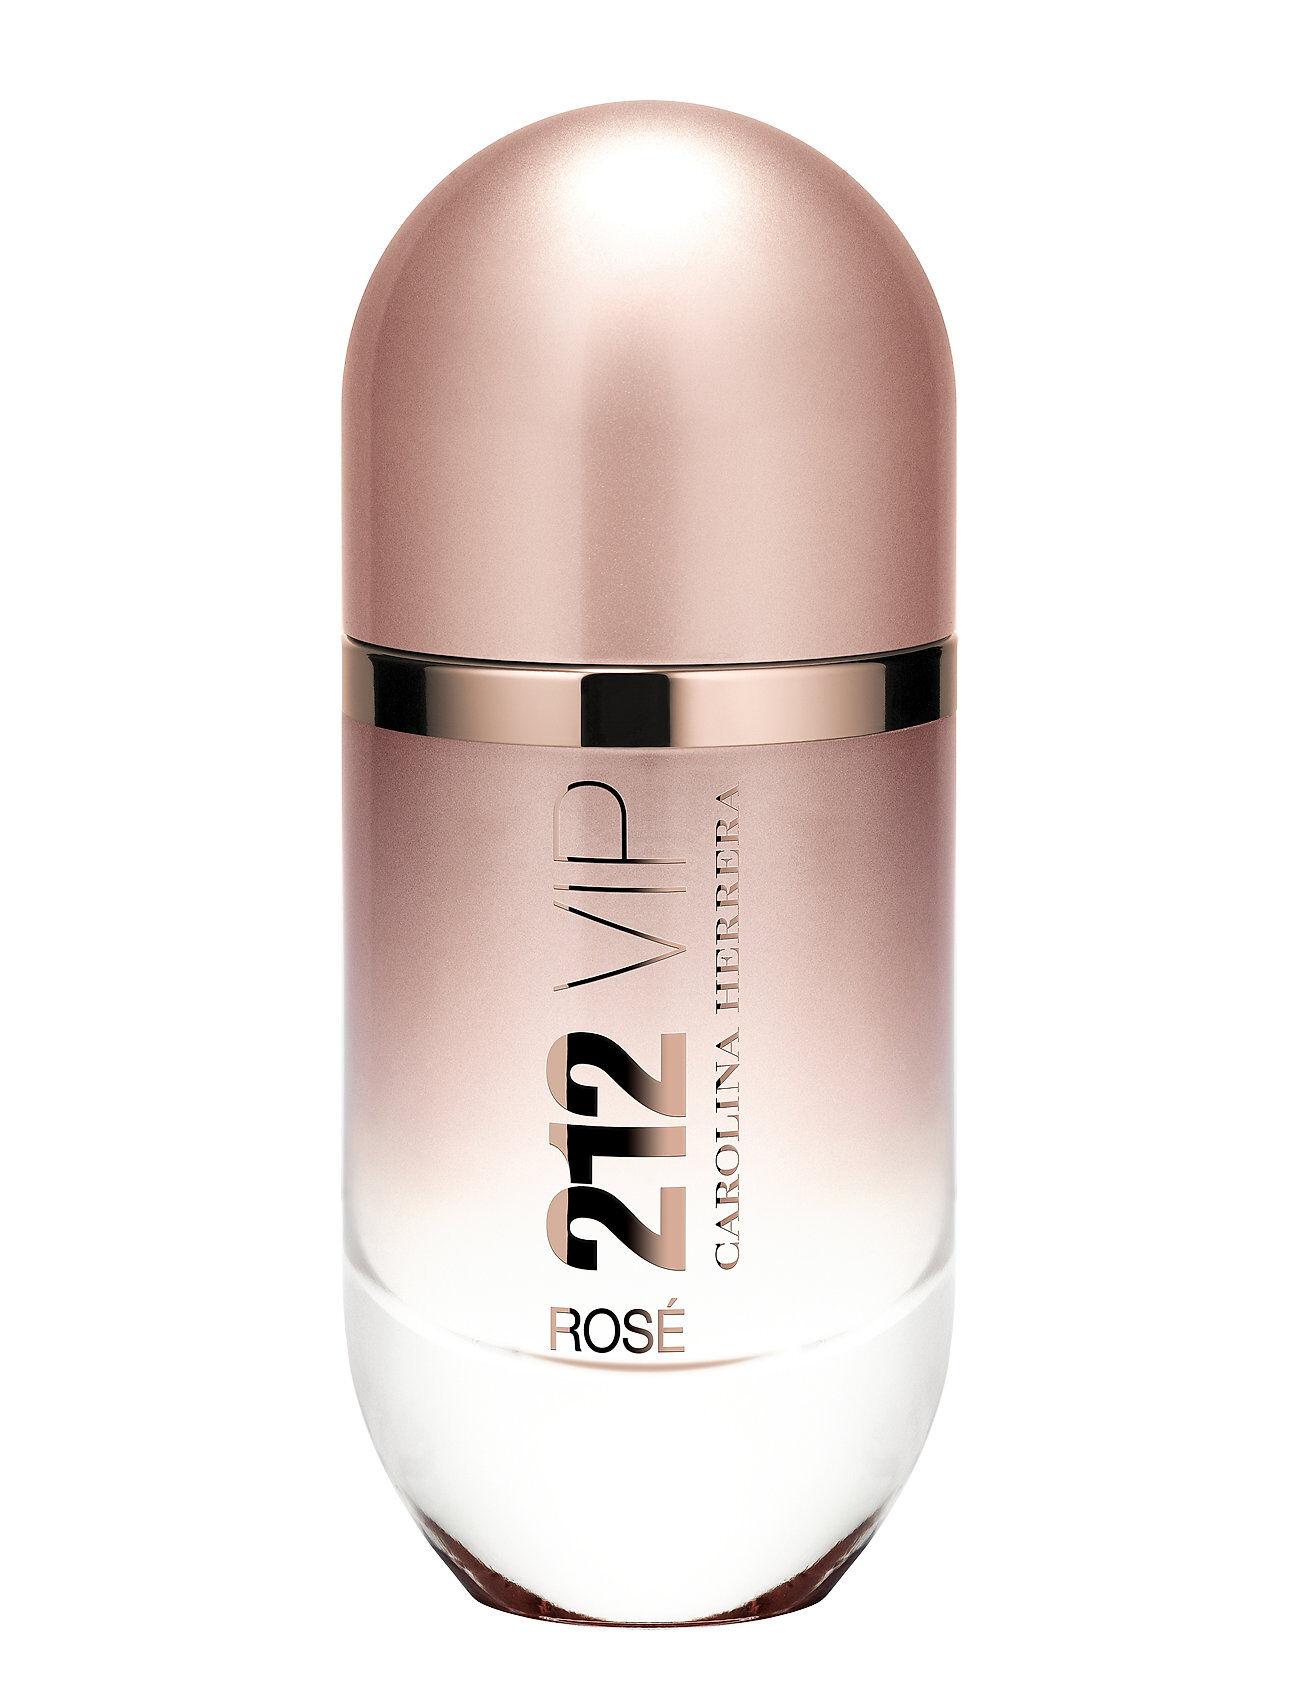 Image of Carolina Herrera 212 Vip Rose Eau De Parfum Hajuvesi Eau De Parfum